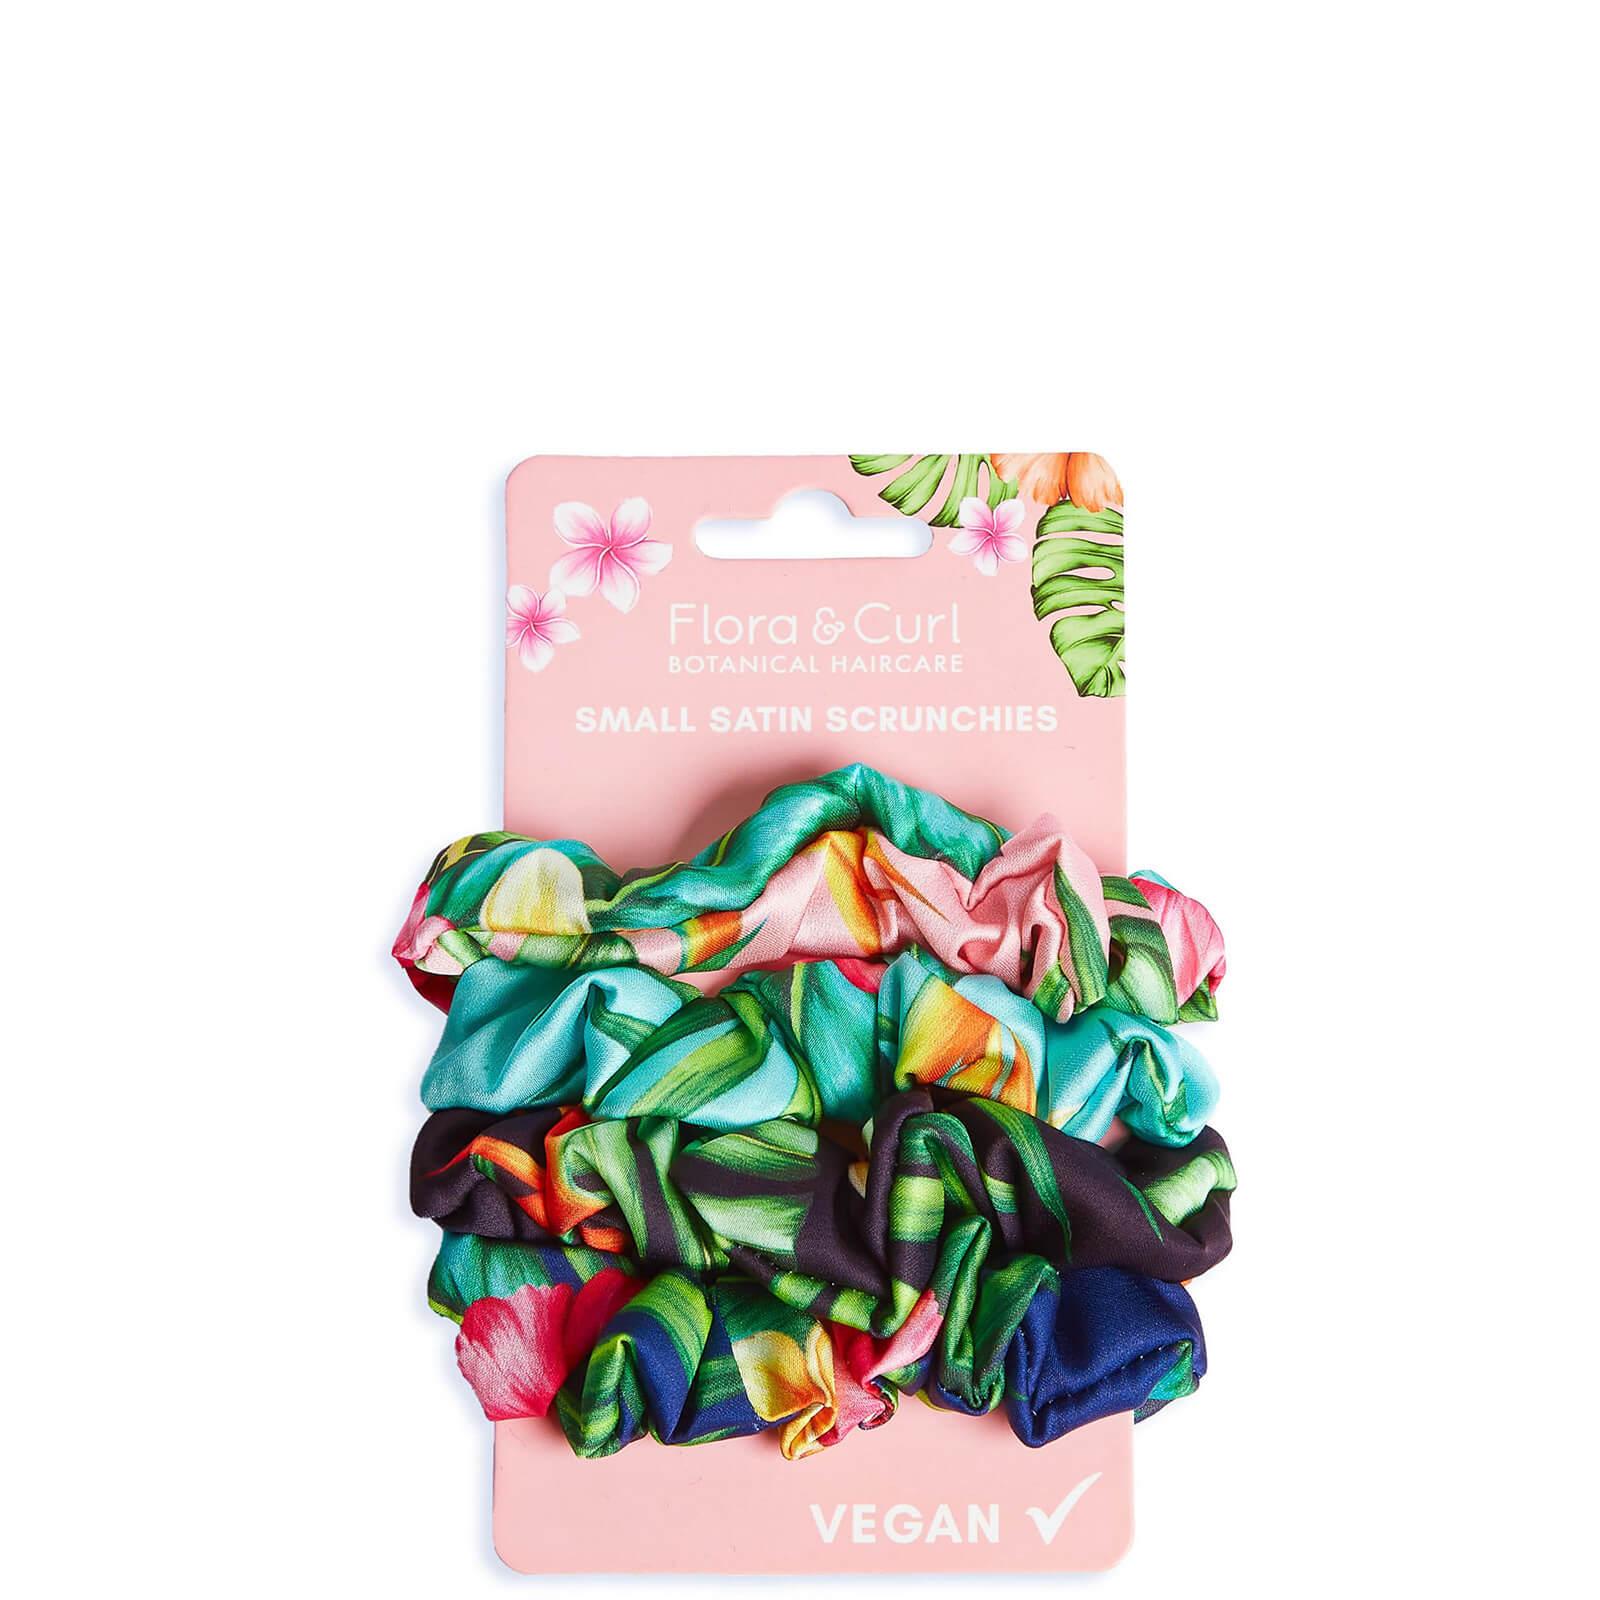 Купить Flora & Curl Small Satin Scrunchies